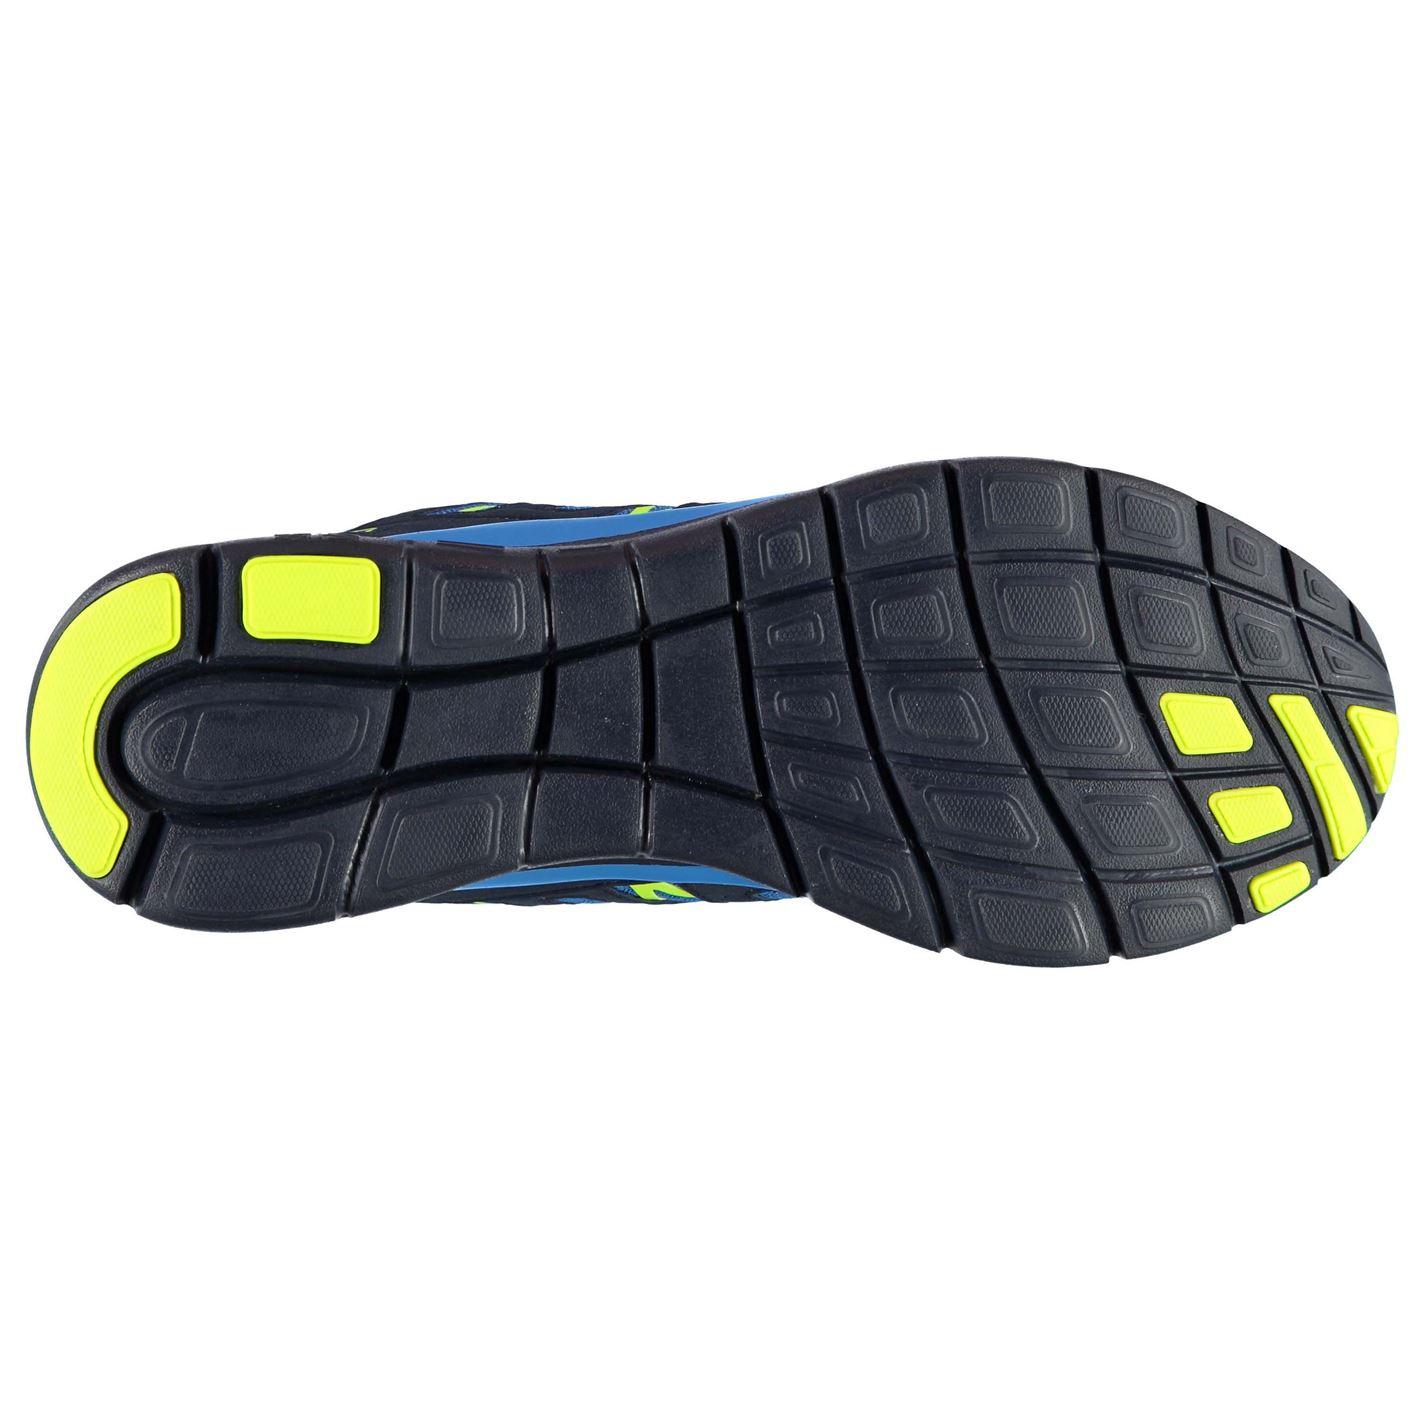 Karrimor-Mens-Duma-Trainers-Lace-Up-Sports-Running-Cross-Training-Shoes thumbnail 50